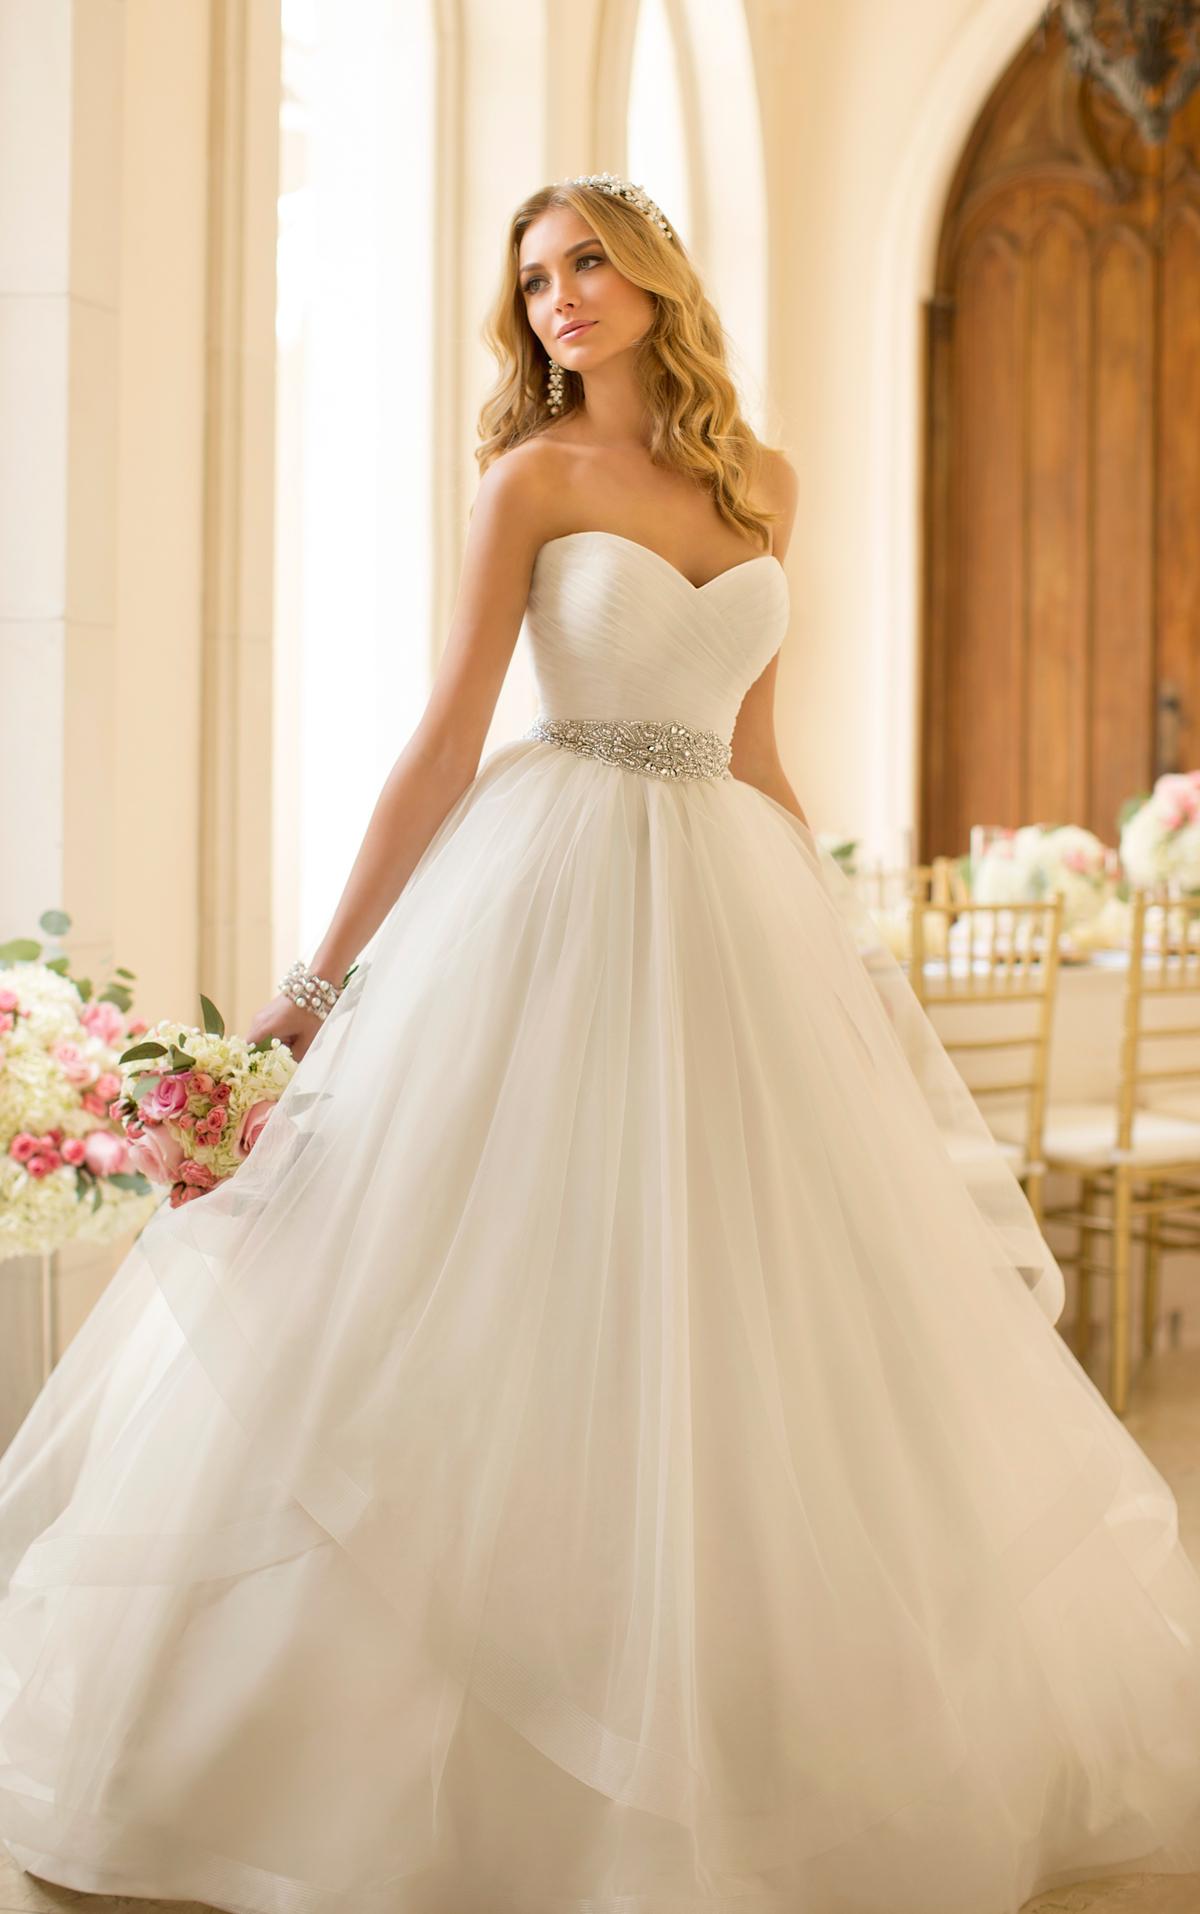 stella wedding dresses photo - 1